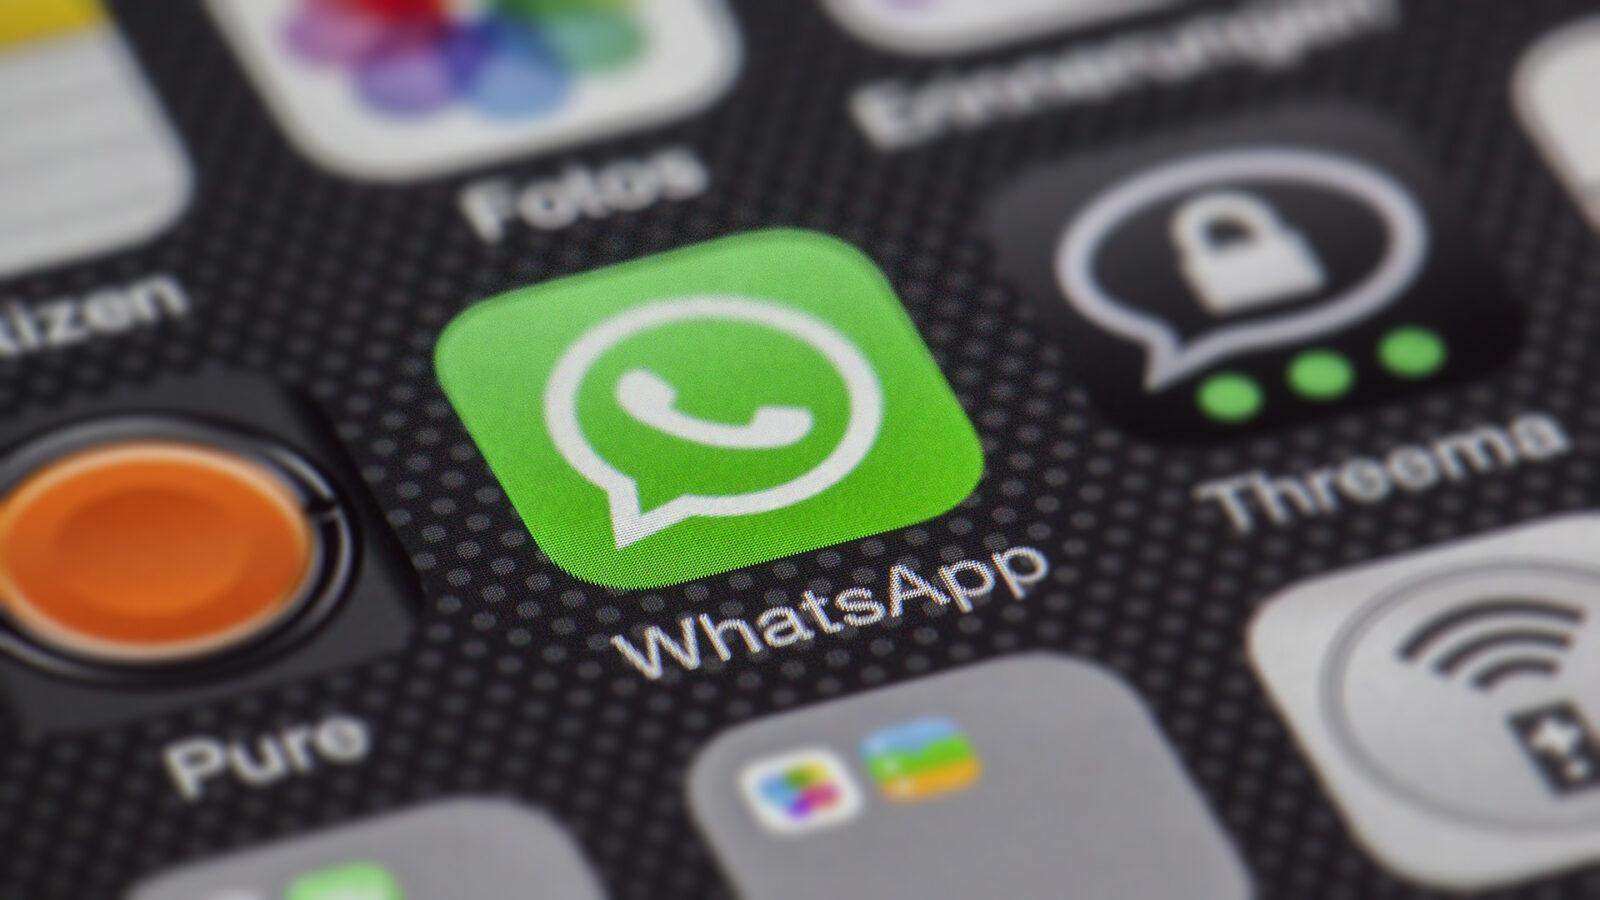 WhatsApp: Messenger im B2B-Marketing sinnvoll einsetzen